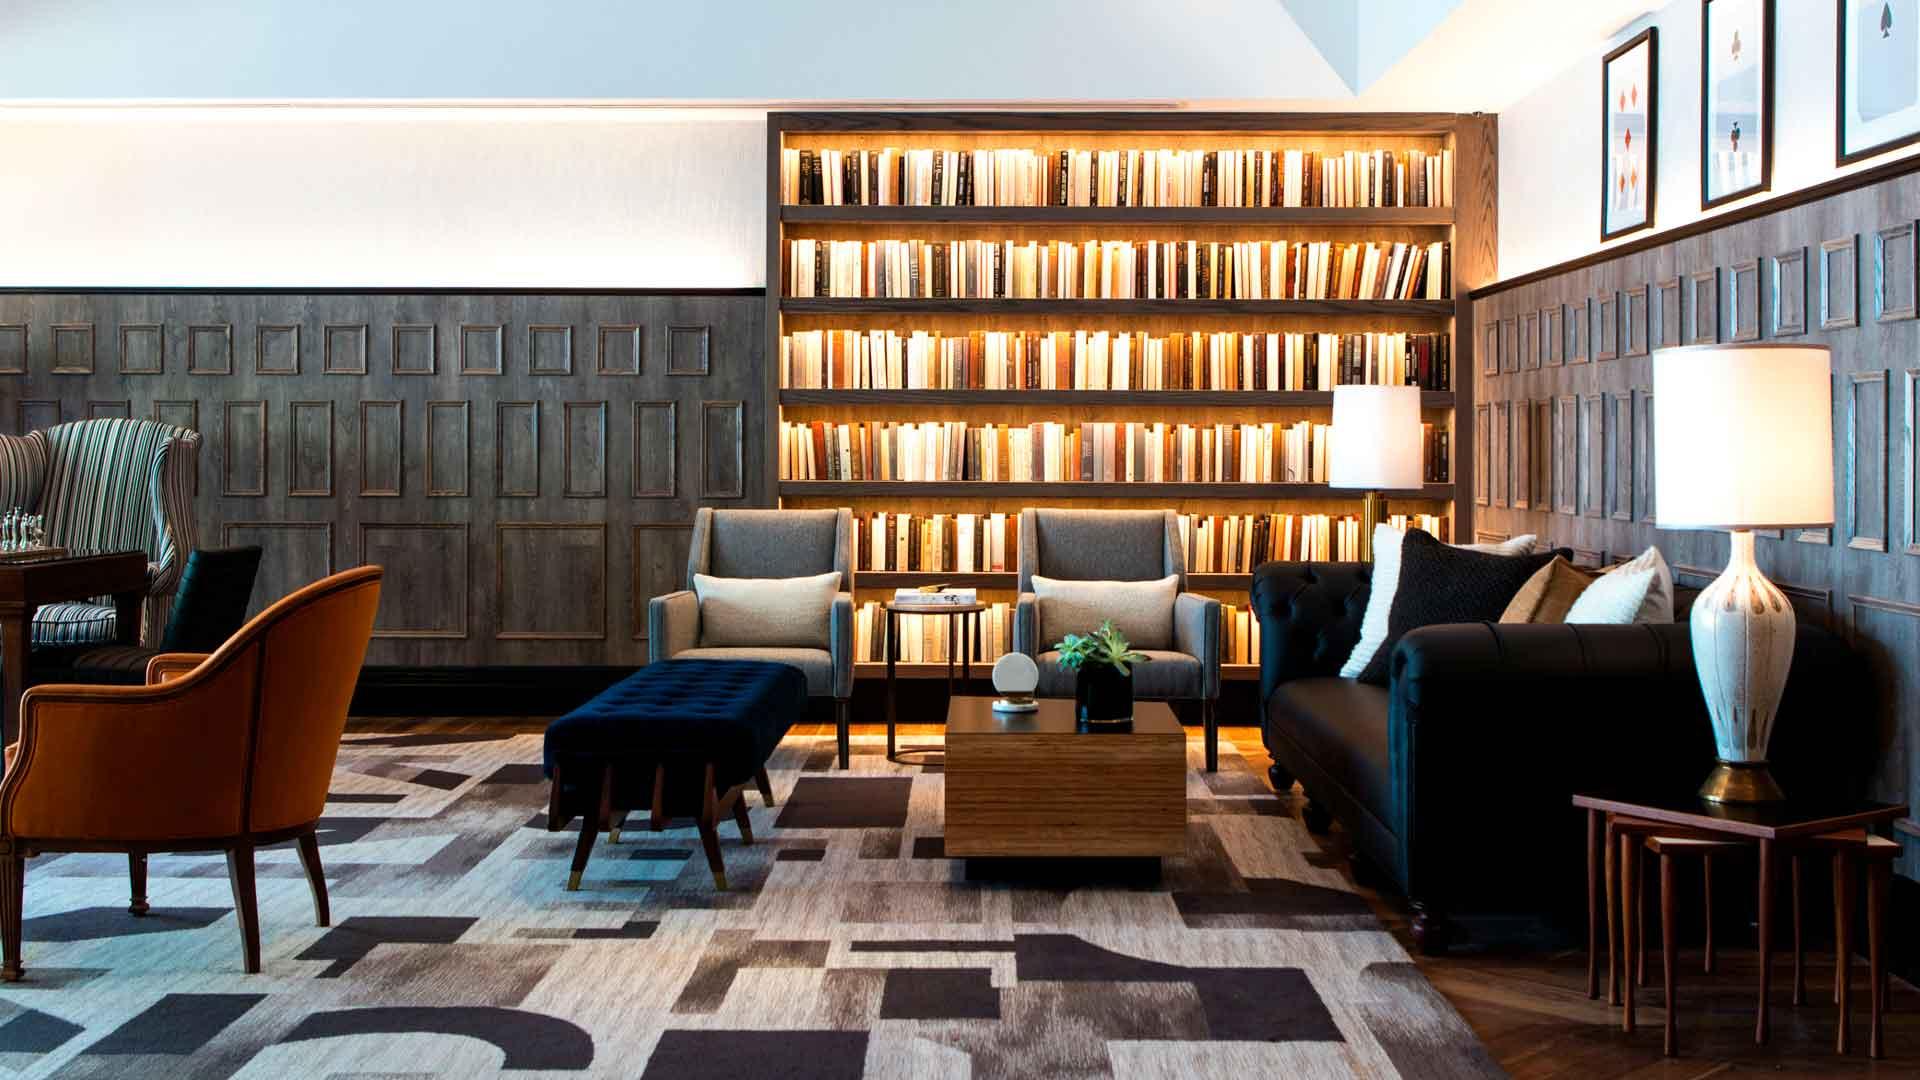 Kimpton Mason & Rook Hotel, descanso con estilo